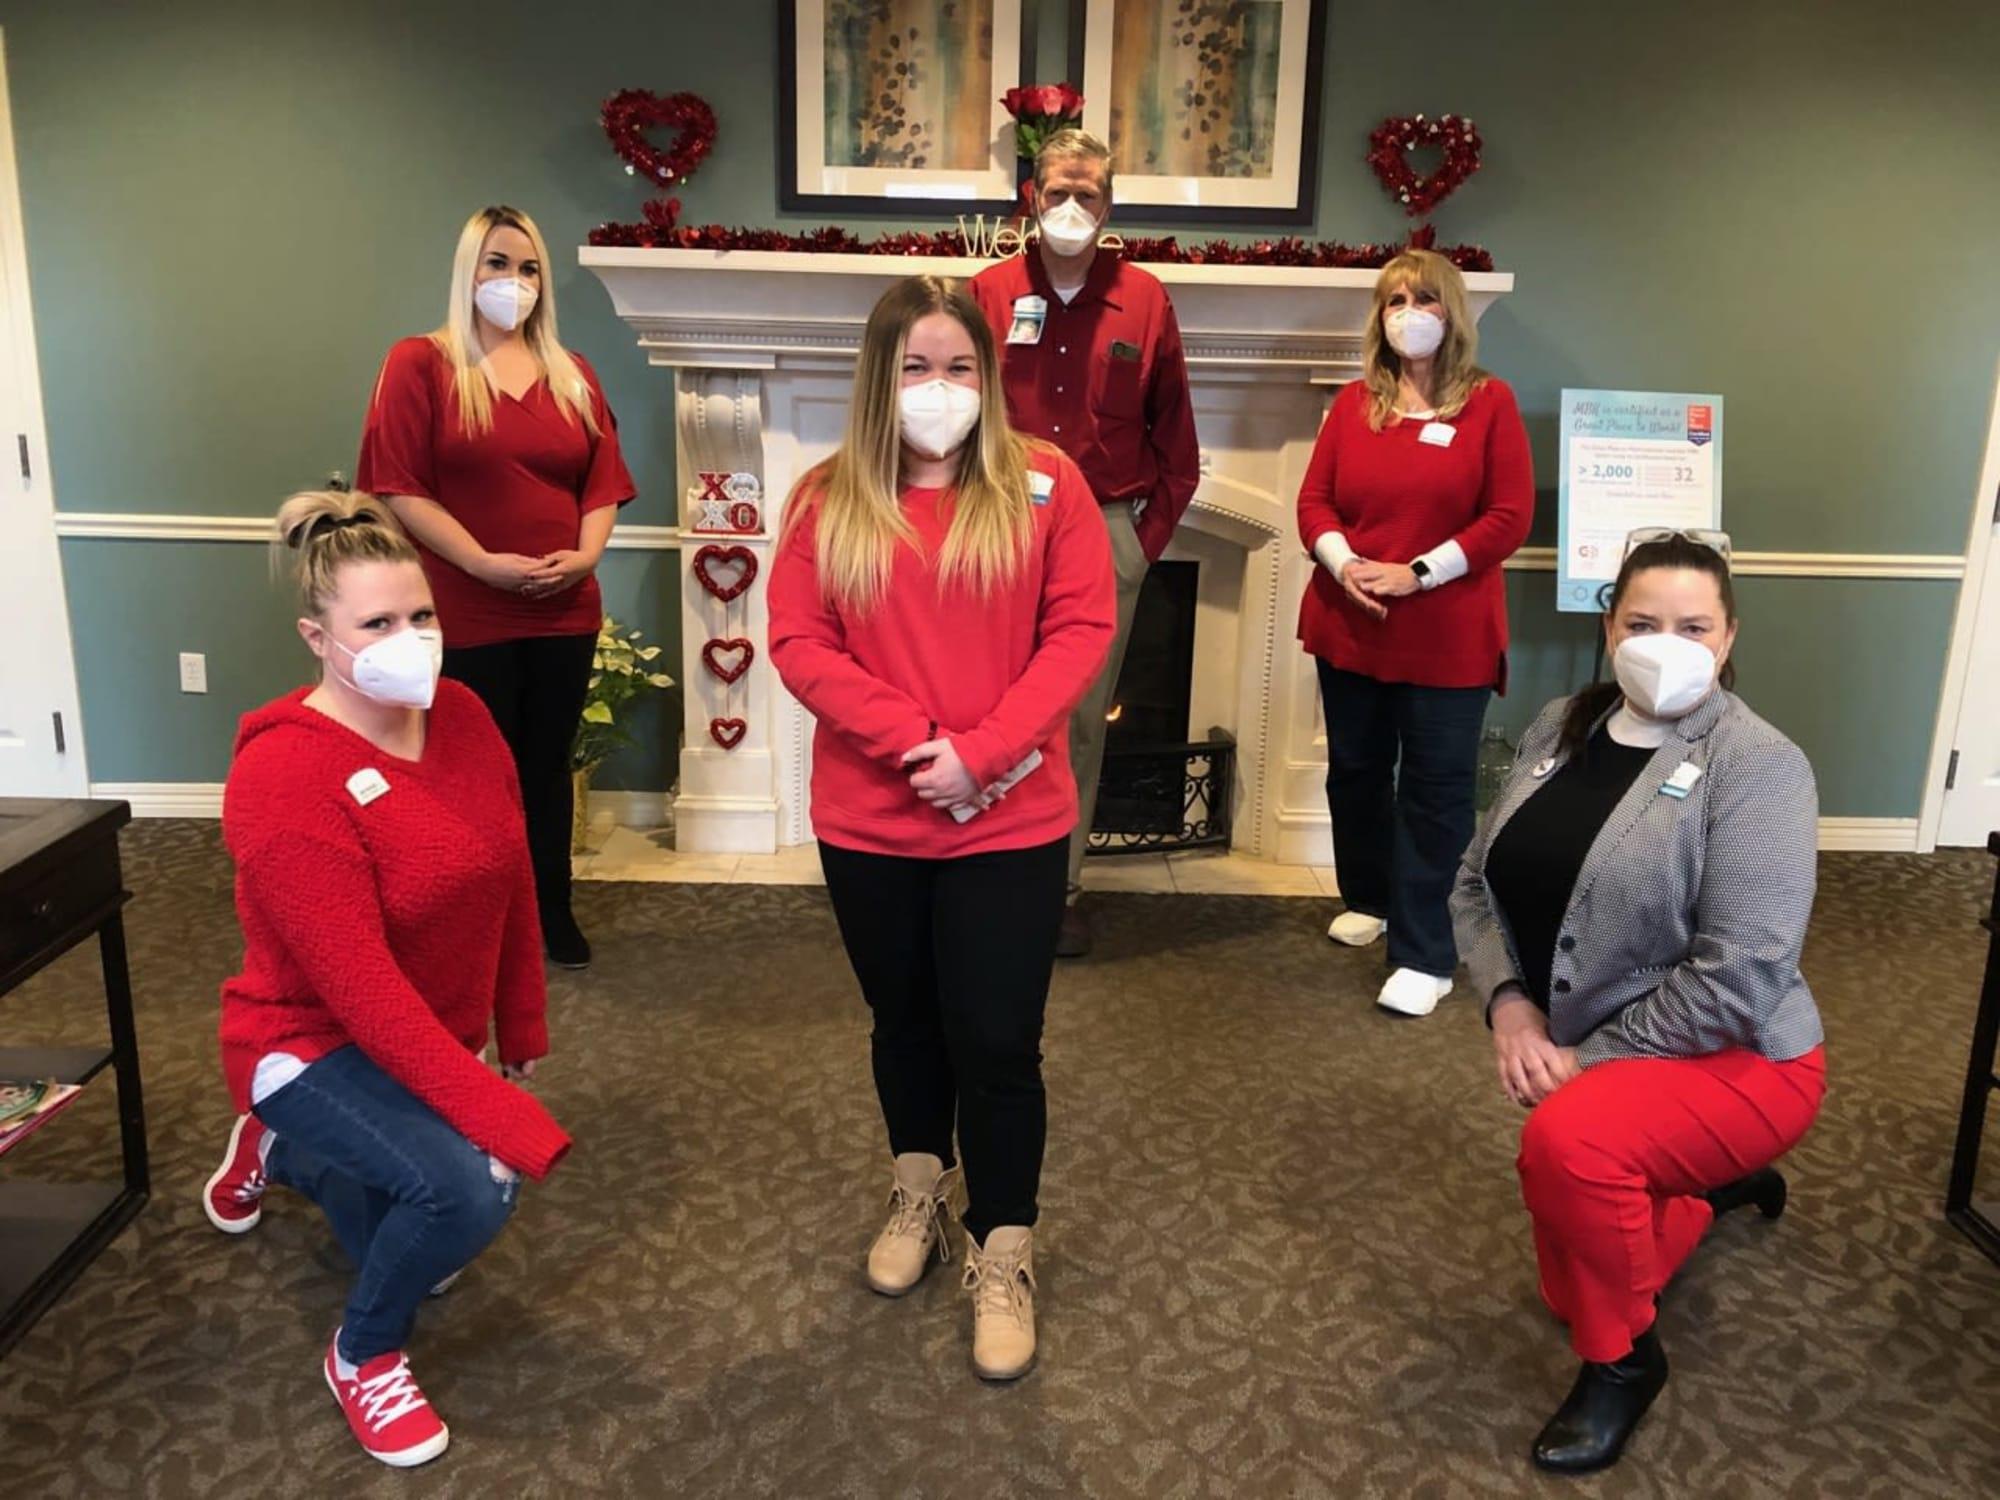 Staff members at The Charleston at Cedar Hills in Cedar Hills, Utah